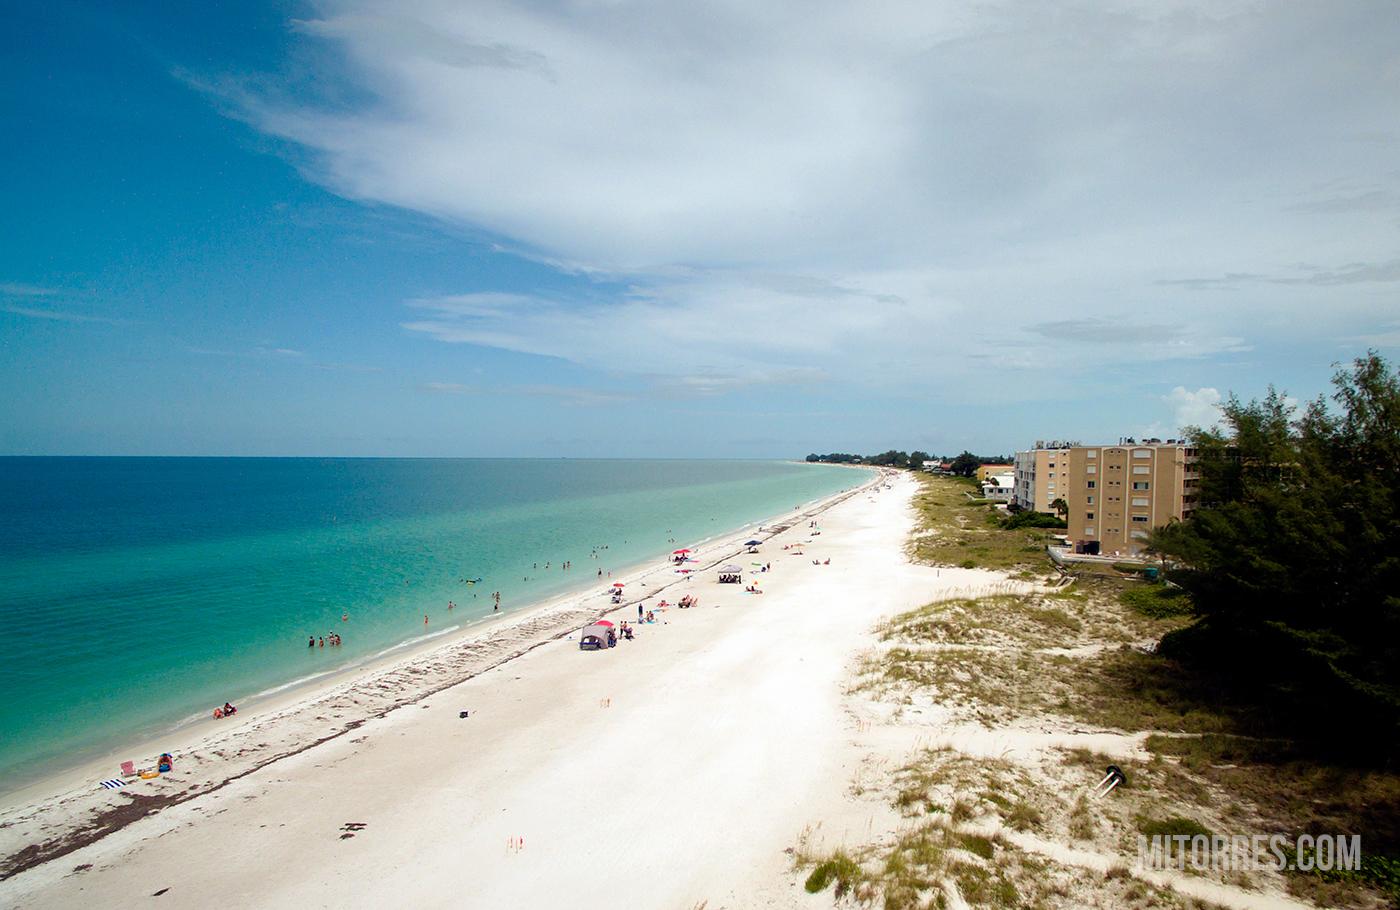 Holmes Beach, Anna Maria Island, Florida.  Photo: Marlon I. Torres